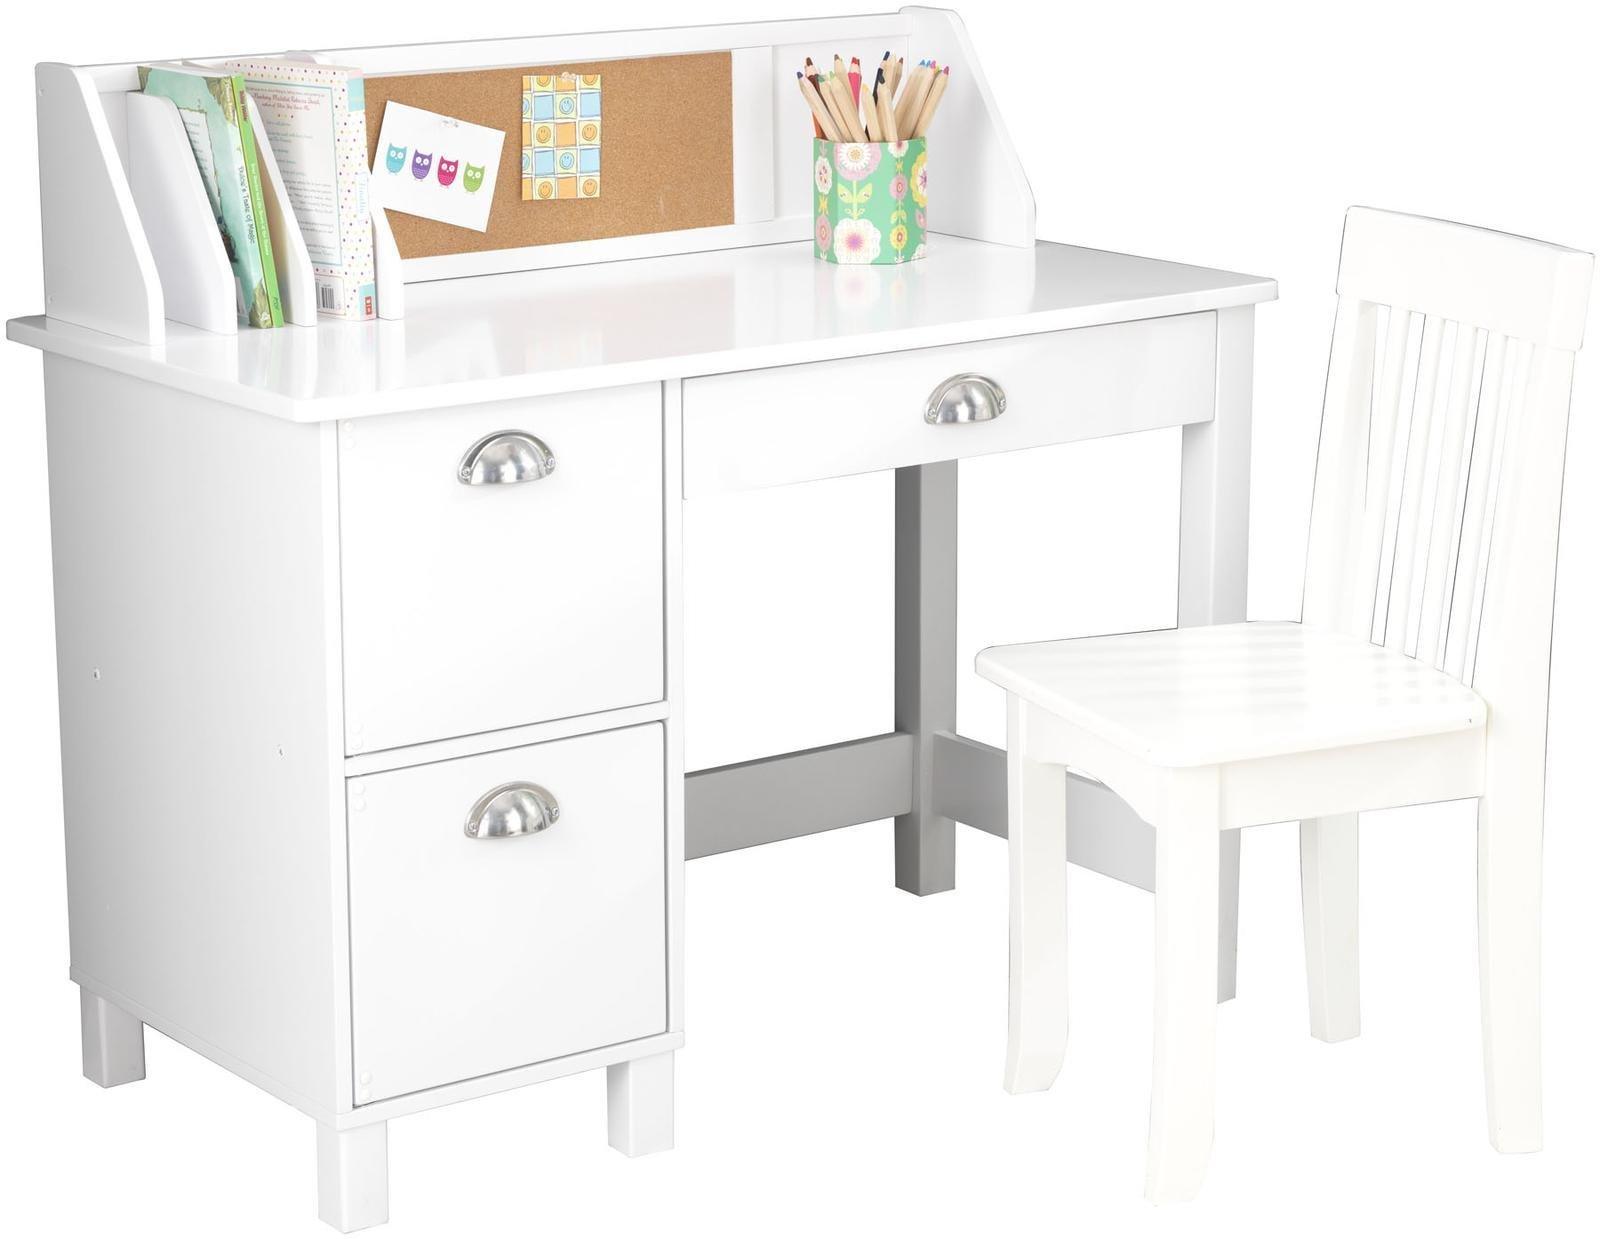 KidKraft Kids Study Desk with Chair-White by KidKraft